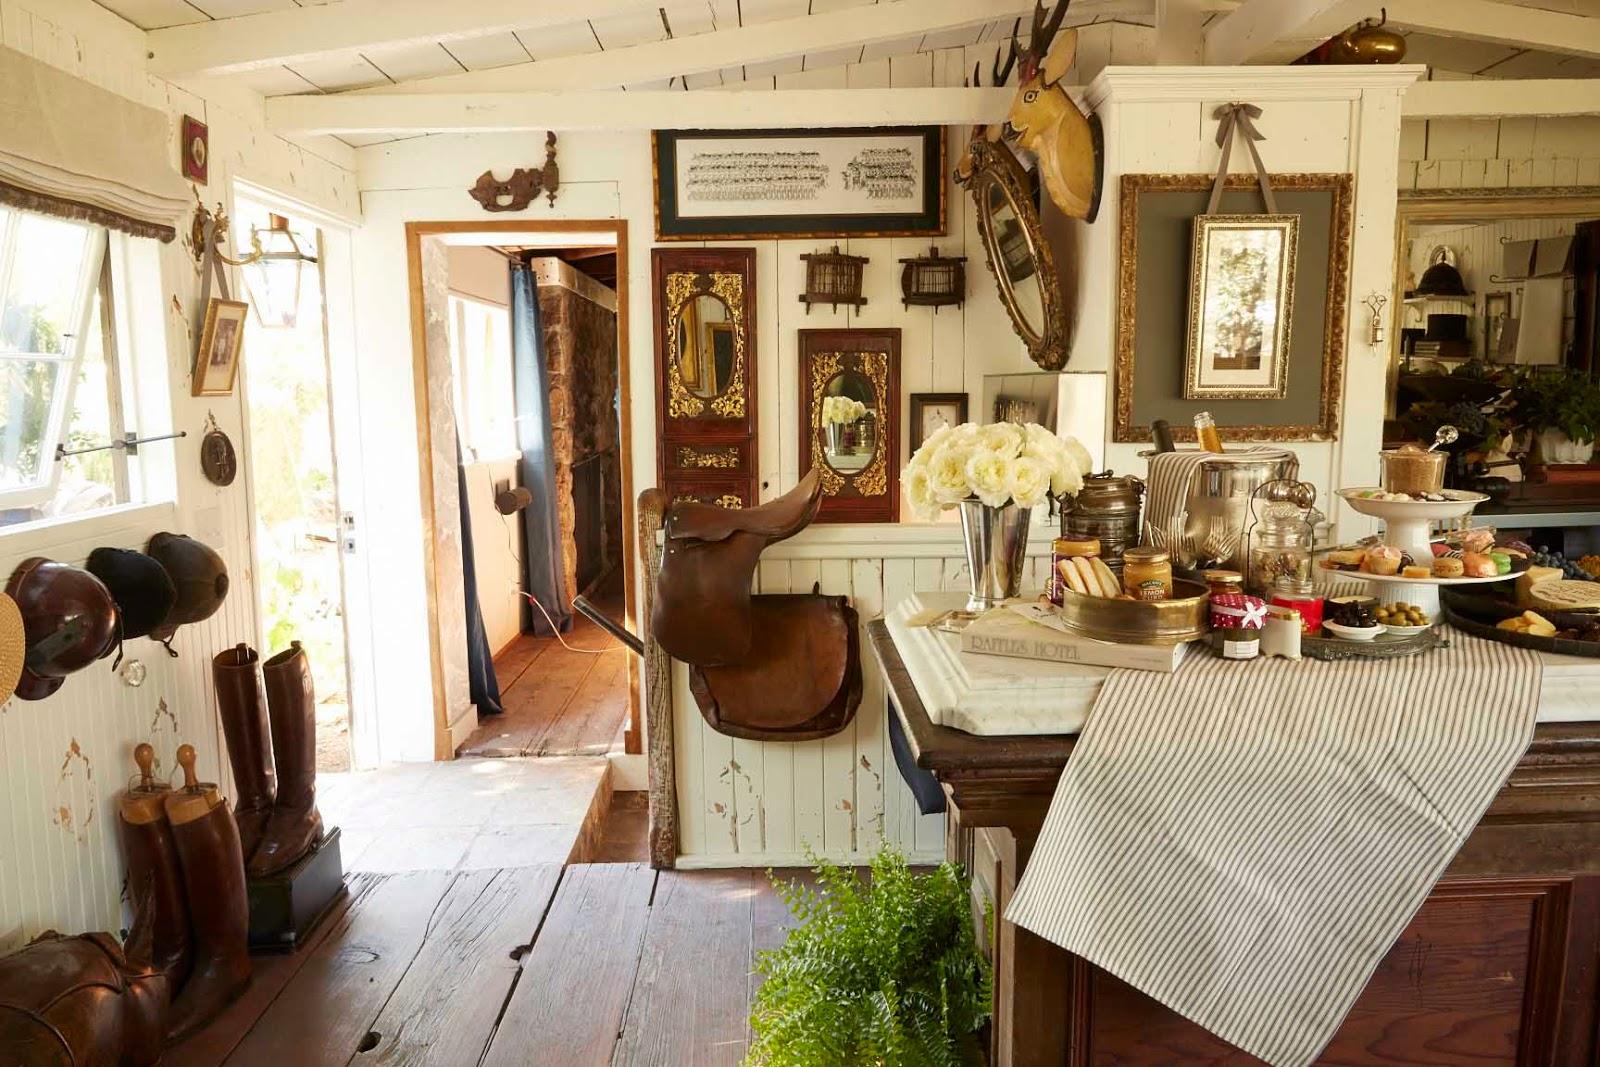 The Style Saloniste Positively British San Francisco Interior Designer Jonathan Rachman Transforms A Napa Valley Farmhouse Into An Evocative Retreat With